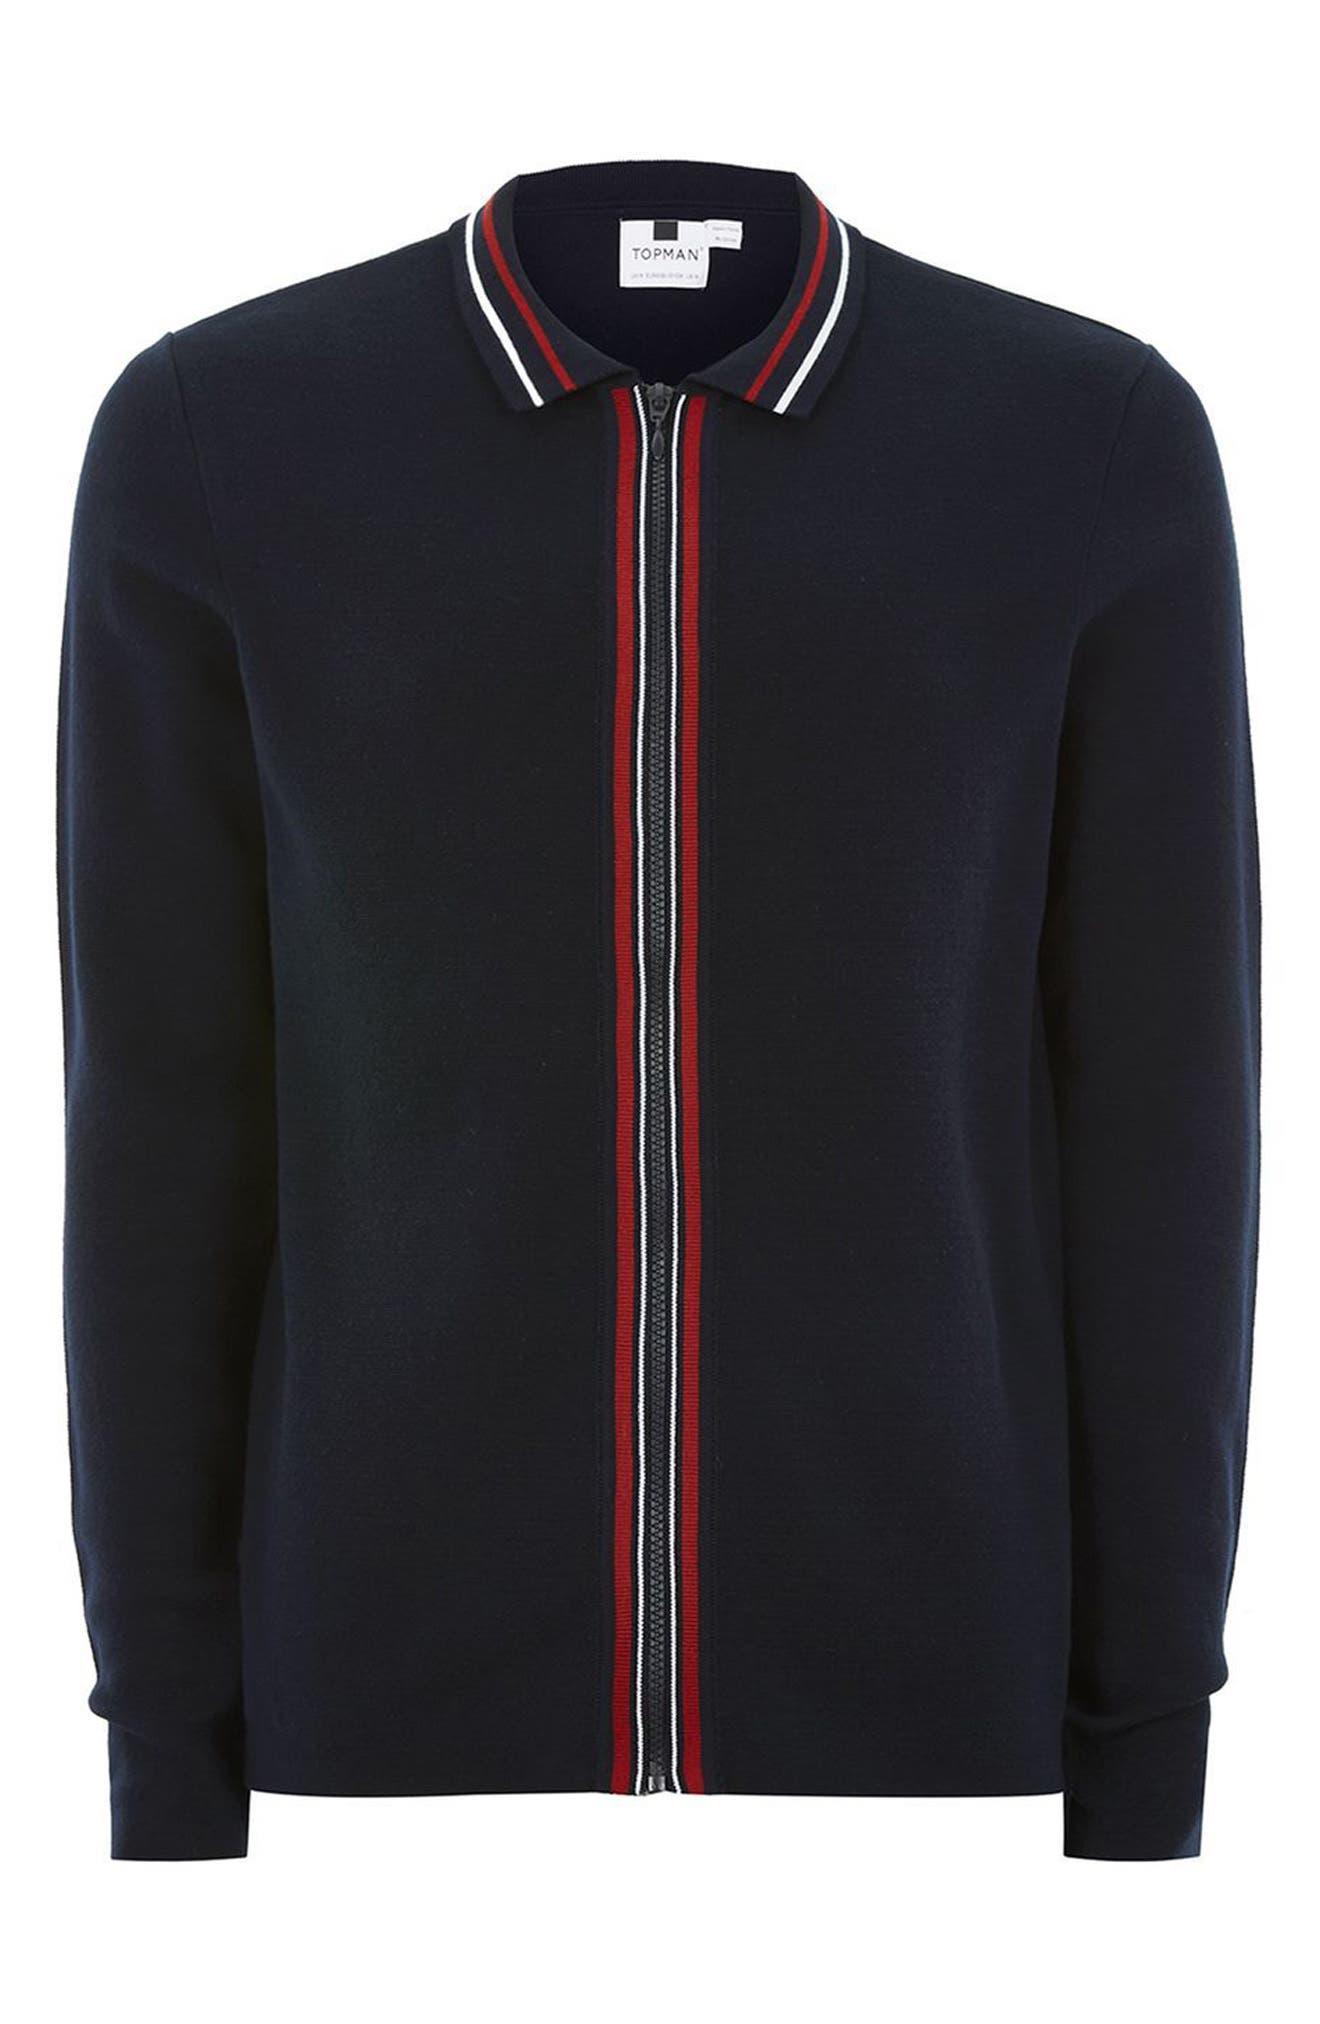 Stripe Knit Zip Front Harrington Sweatshirt,                             Alternate thumbnail 4, color,                             Navy Blue Multi